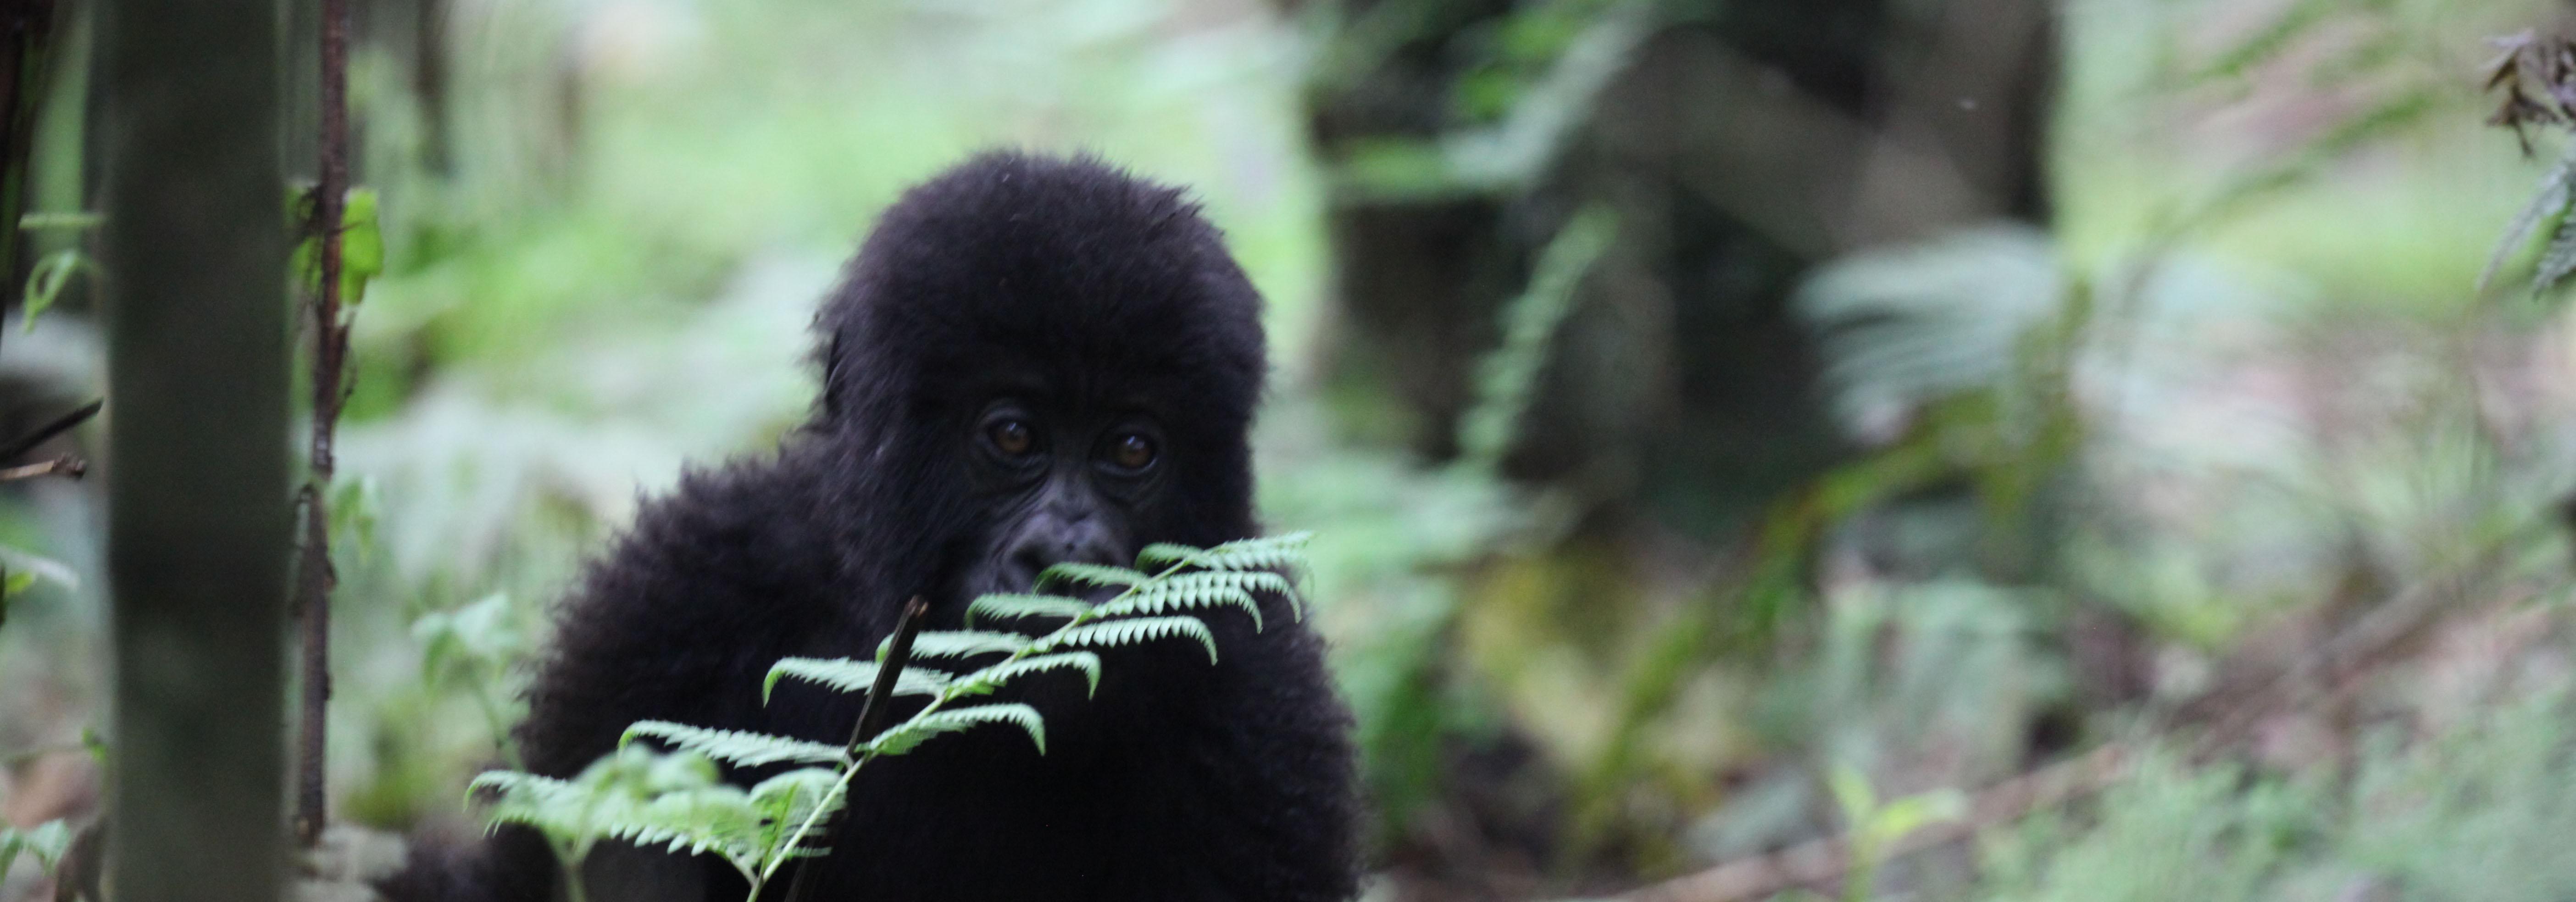 baby mountain gorilla rwanda